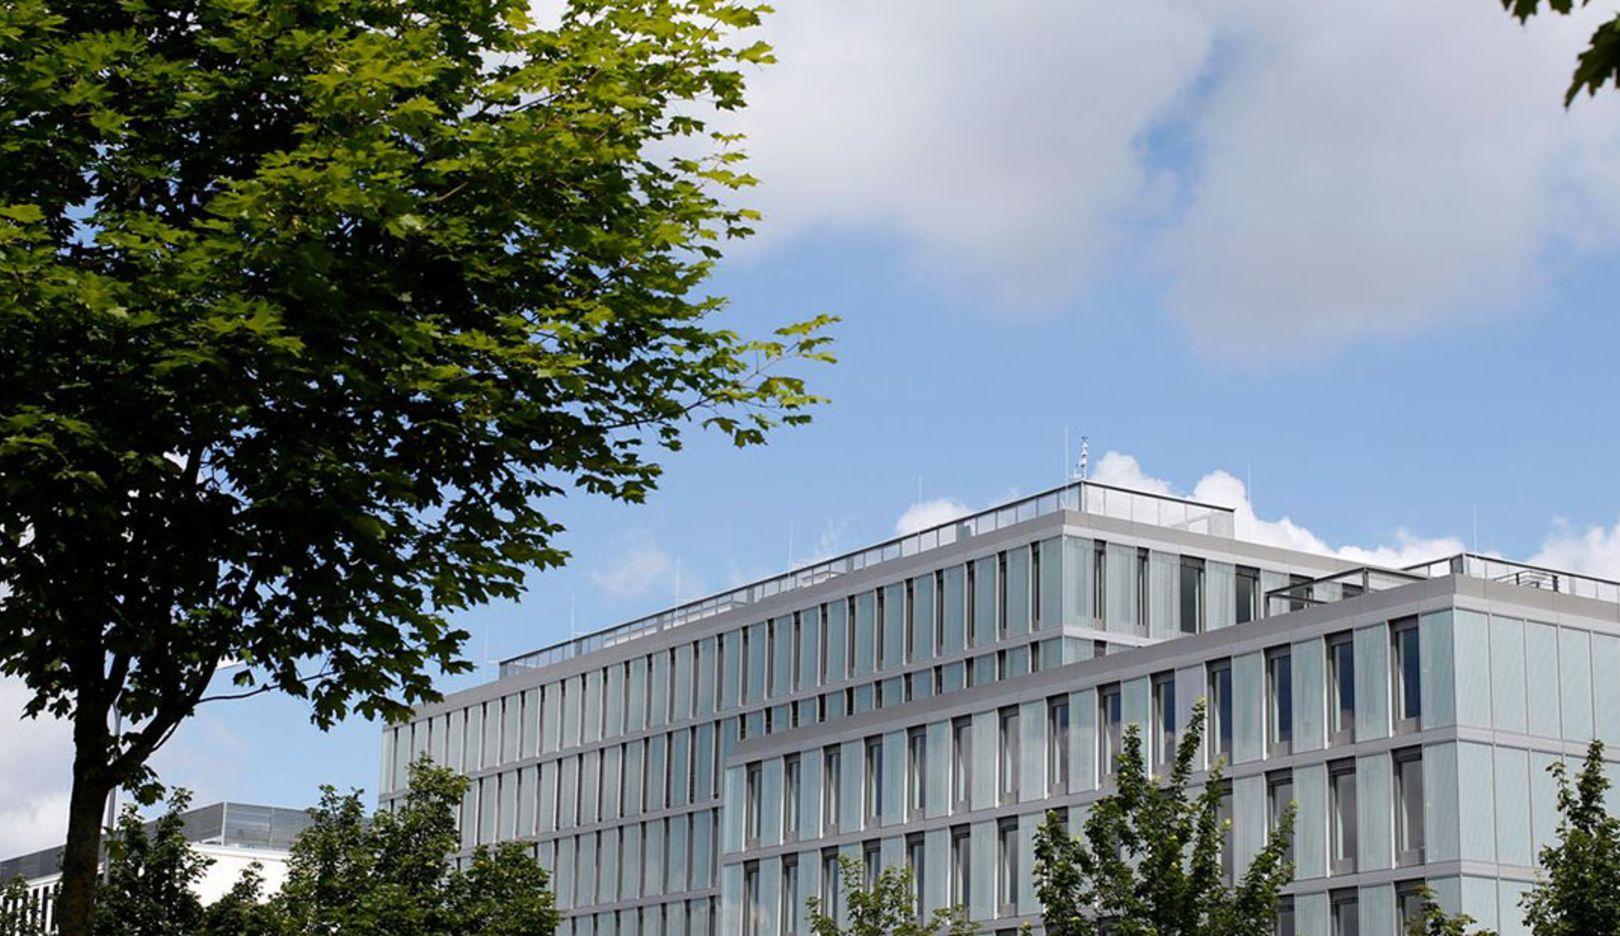 Büro in München, 2016, Porsche Consulting GmbH